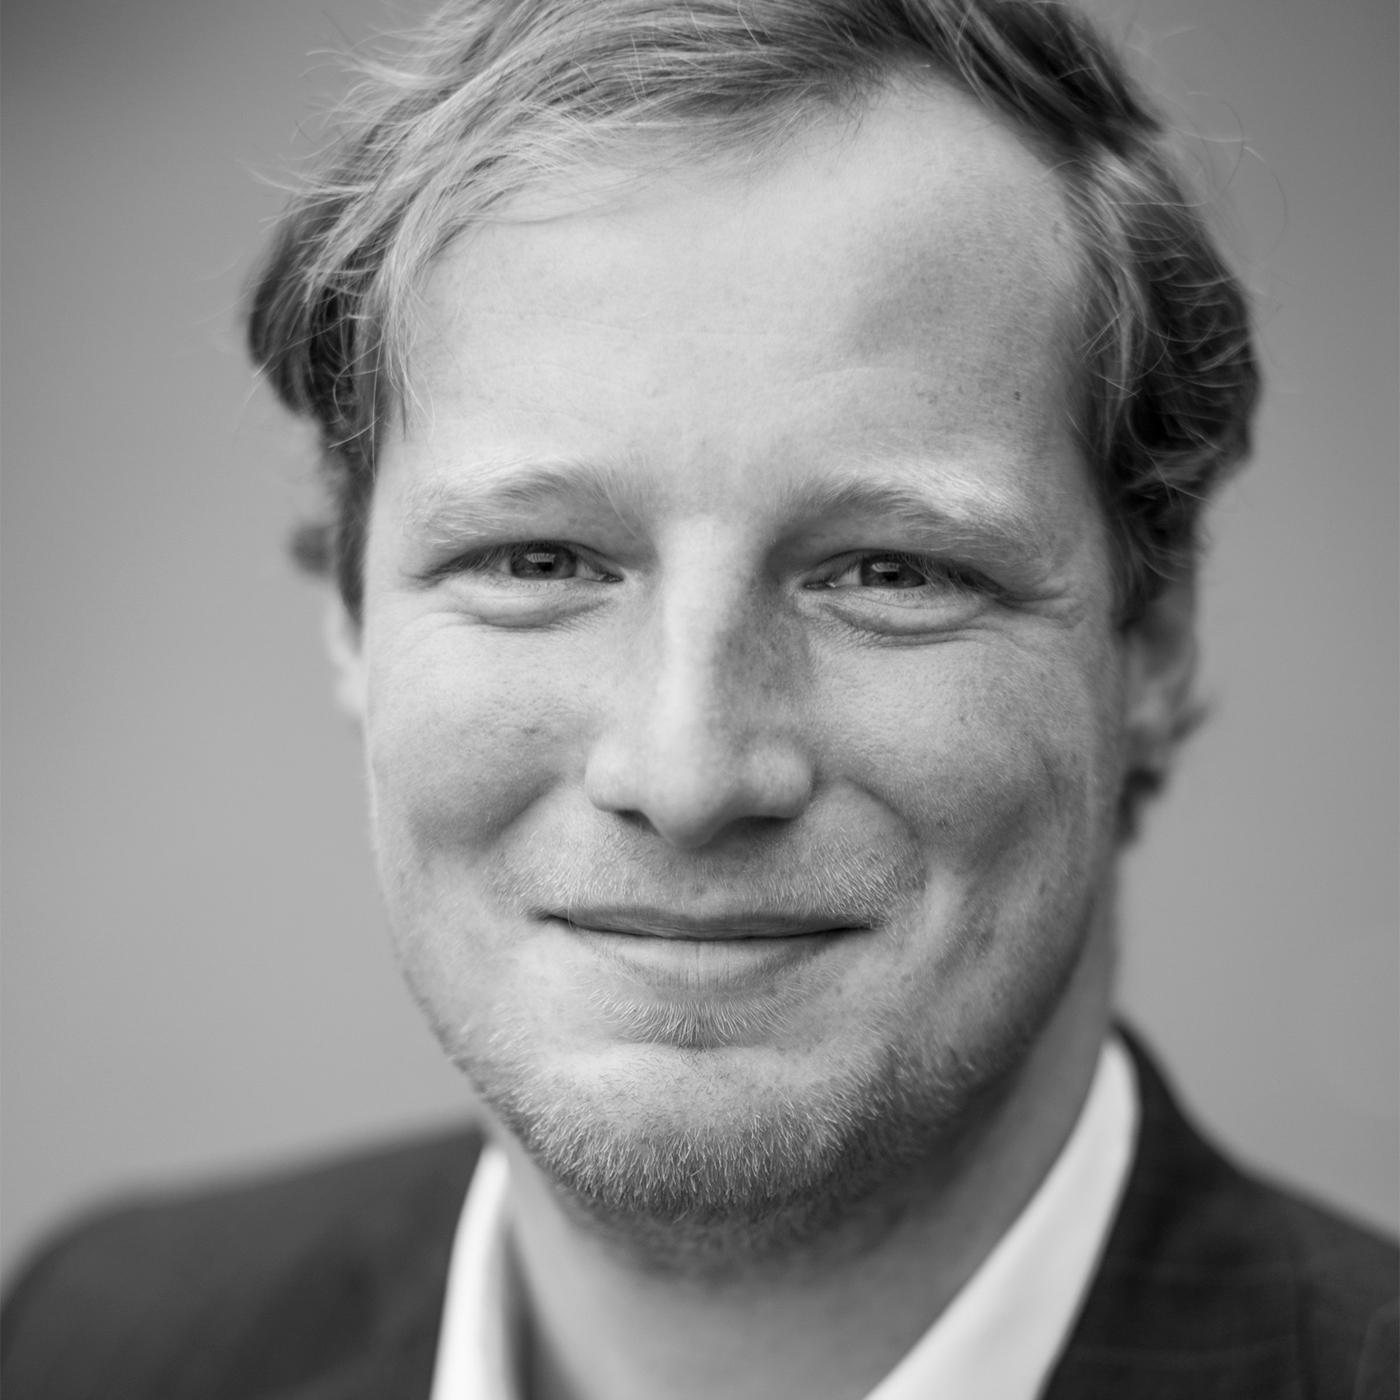 Thijs Leenman